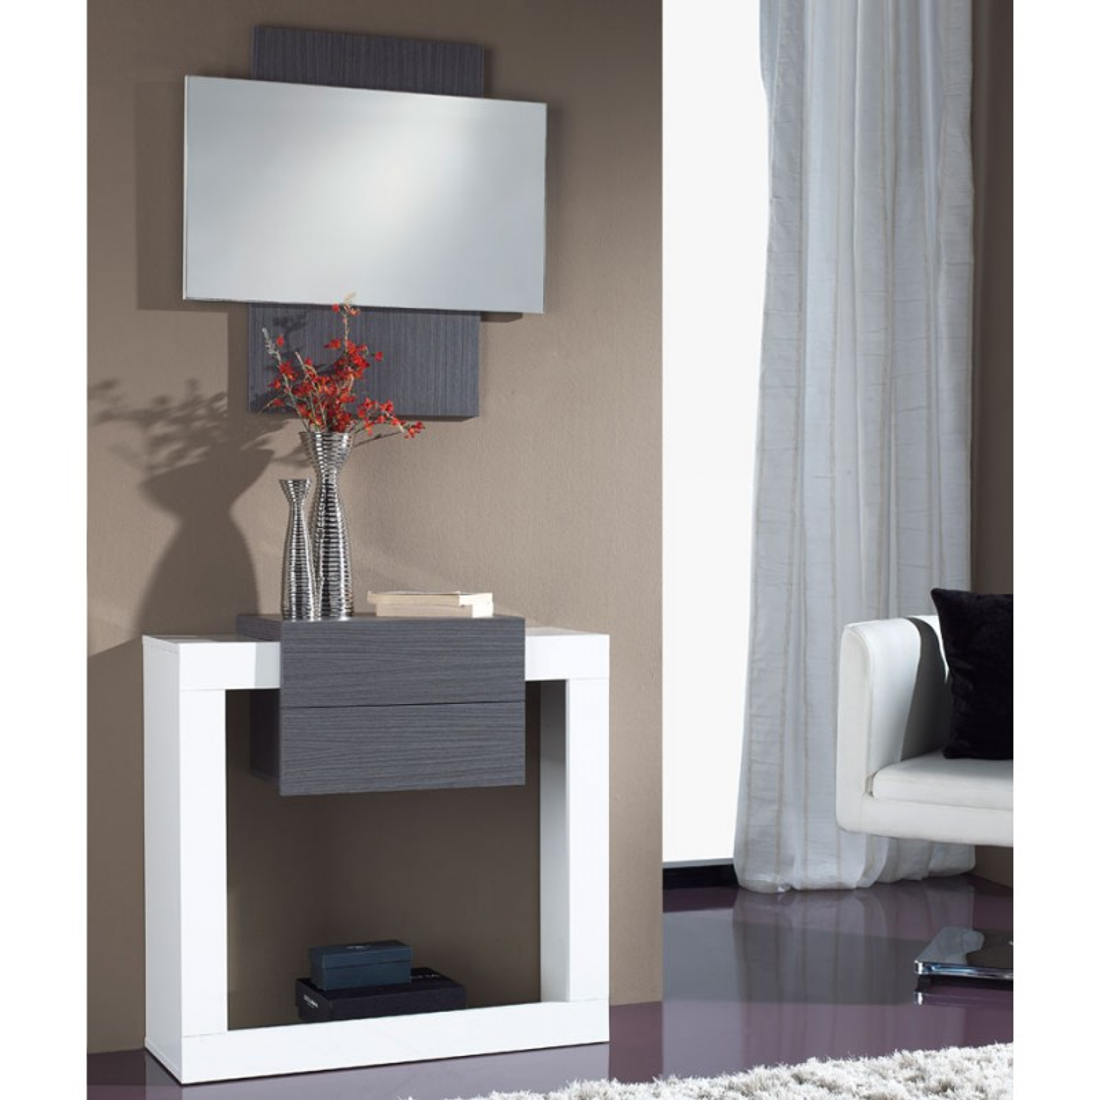 Meuble d 39 entr e blanc cendre miroir neema univers petits meubles - Miroir d entree ...